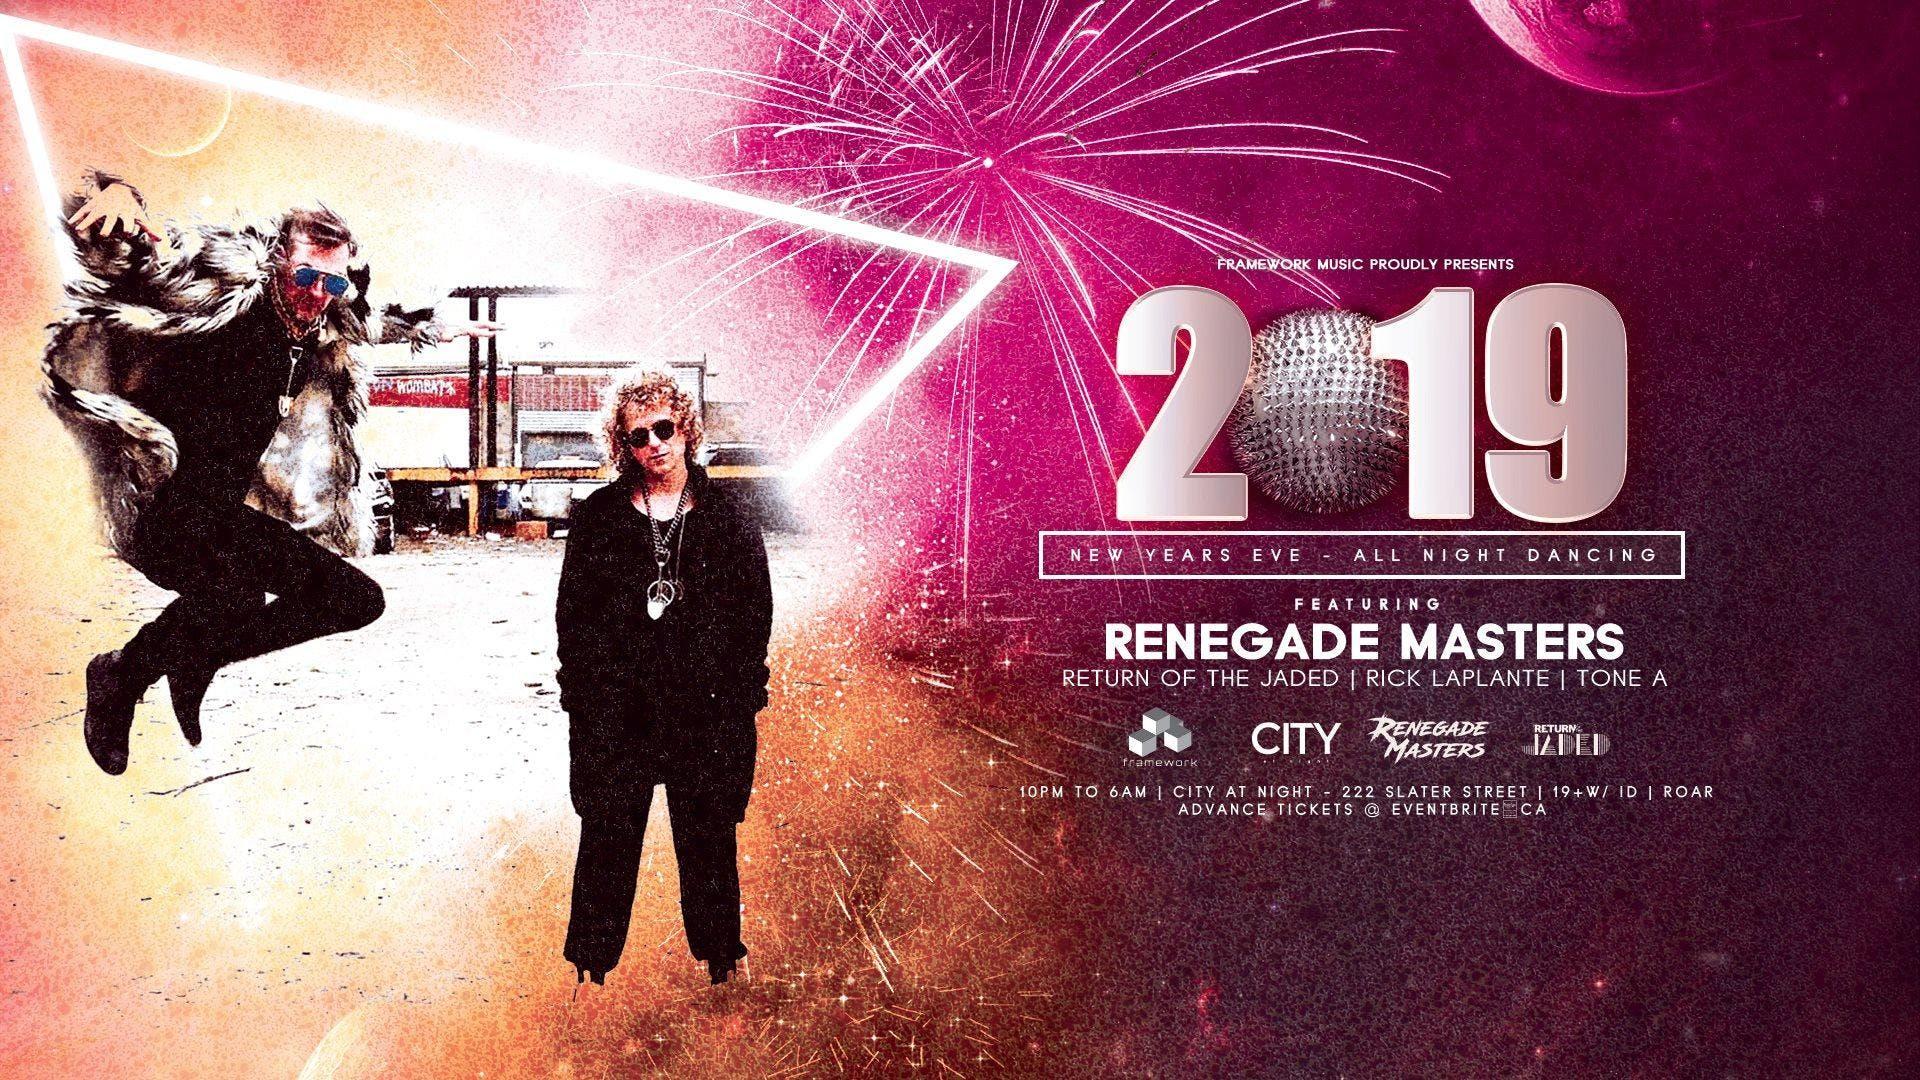 Framework Music NYE w/ Renegade Masters 10pm - 6am